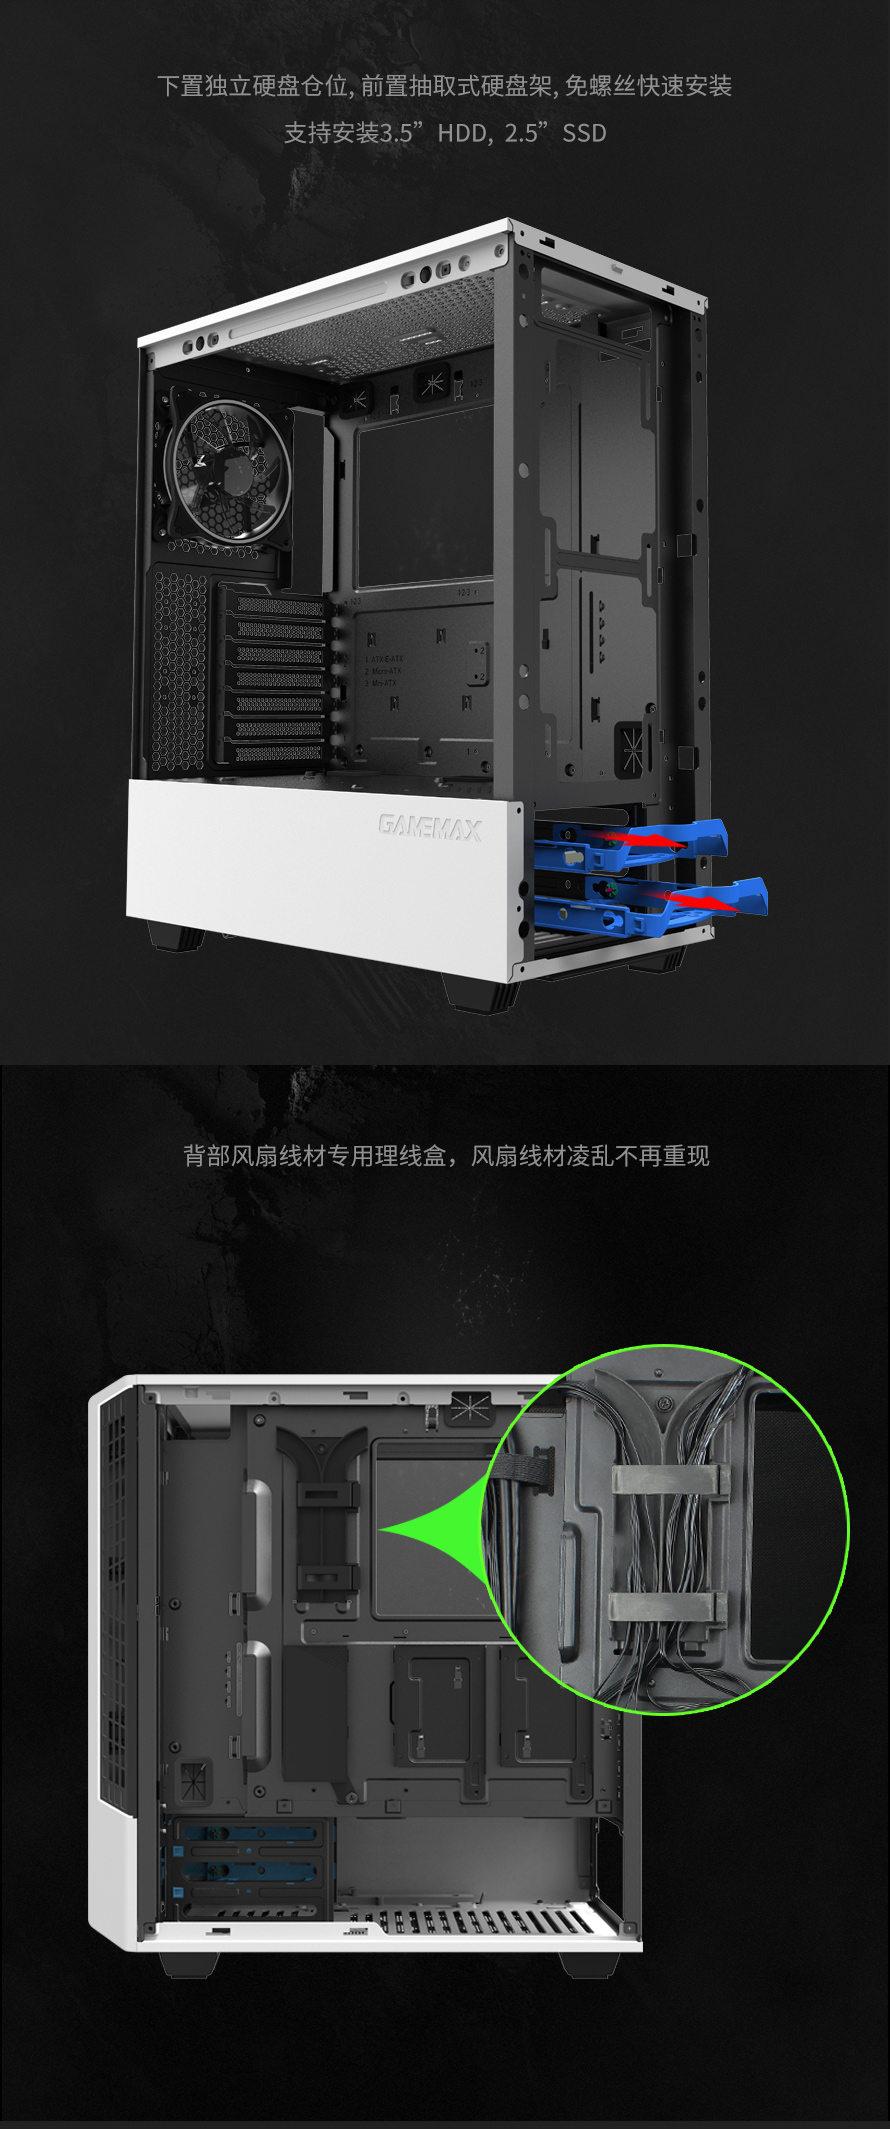 T802_Panda详情页中文_看图王2_05.jpg